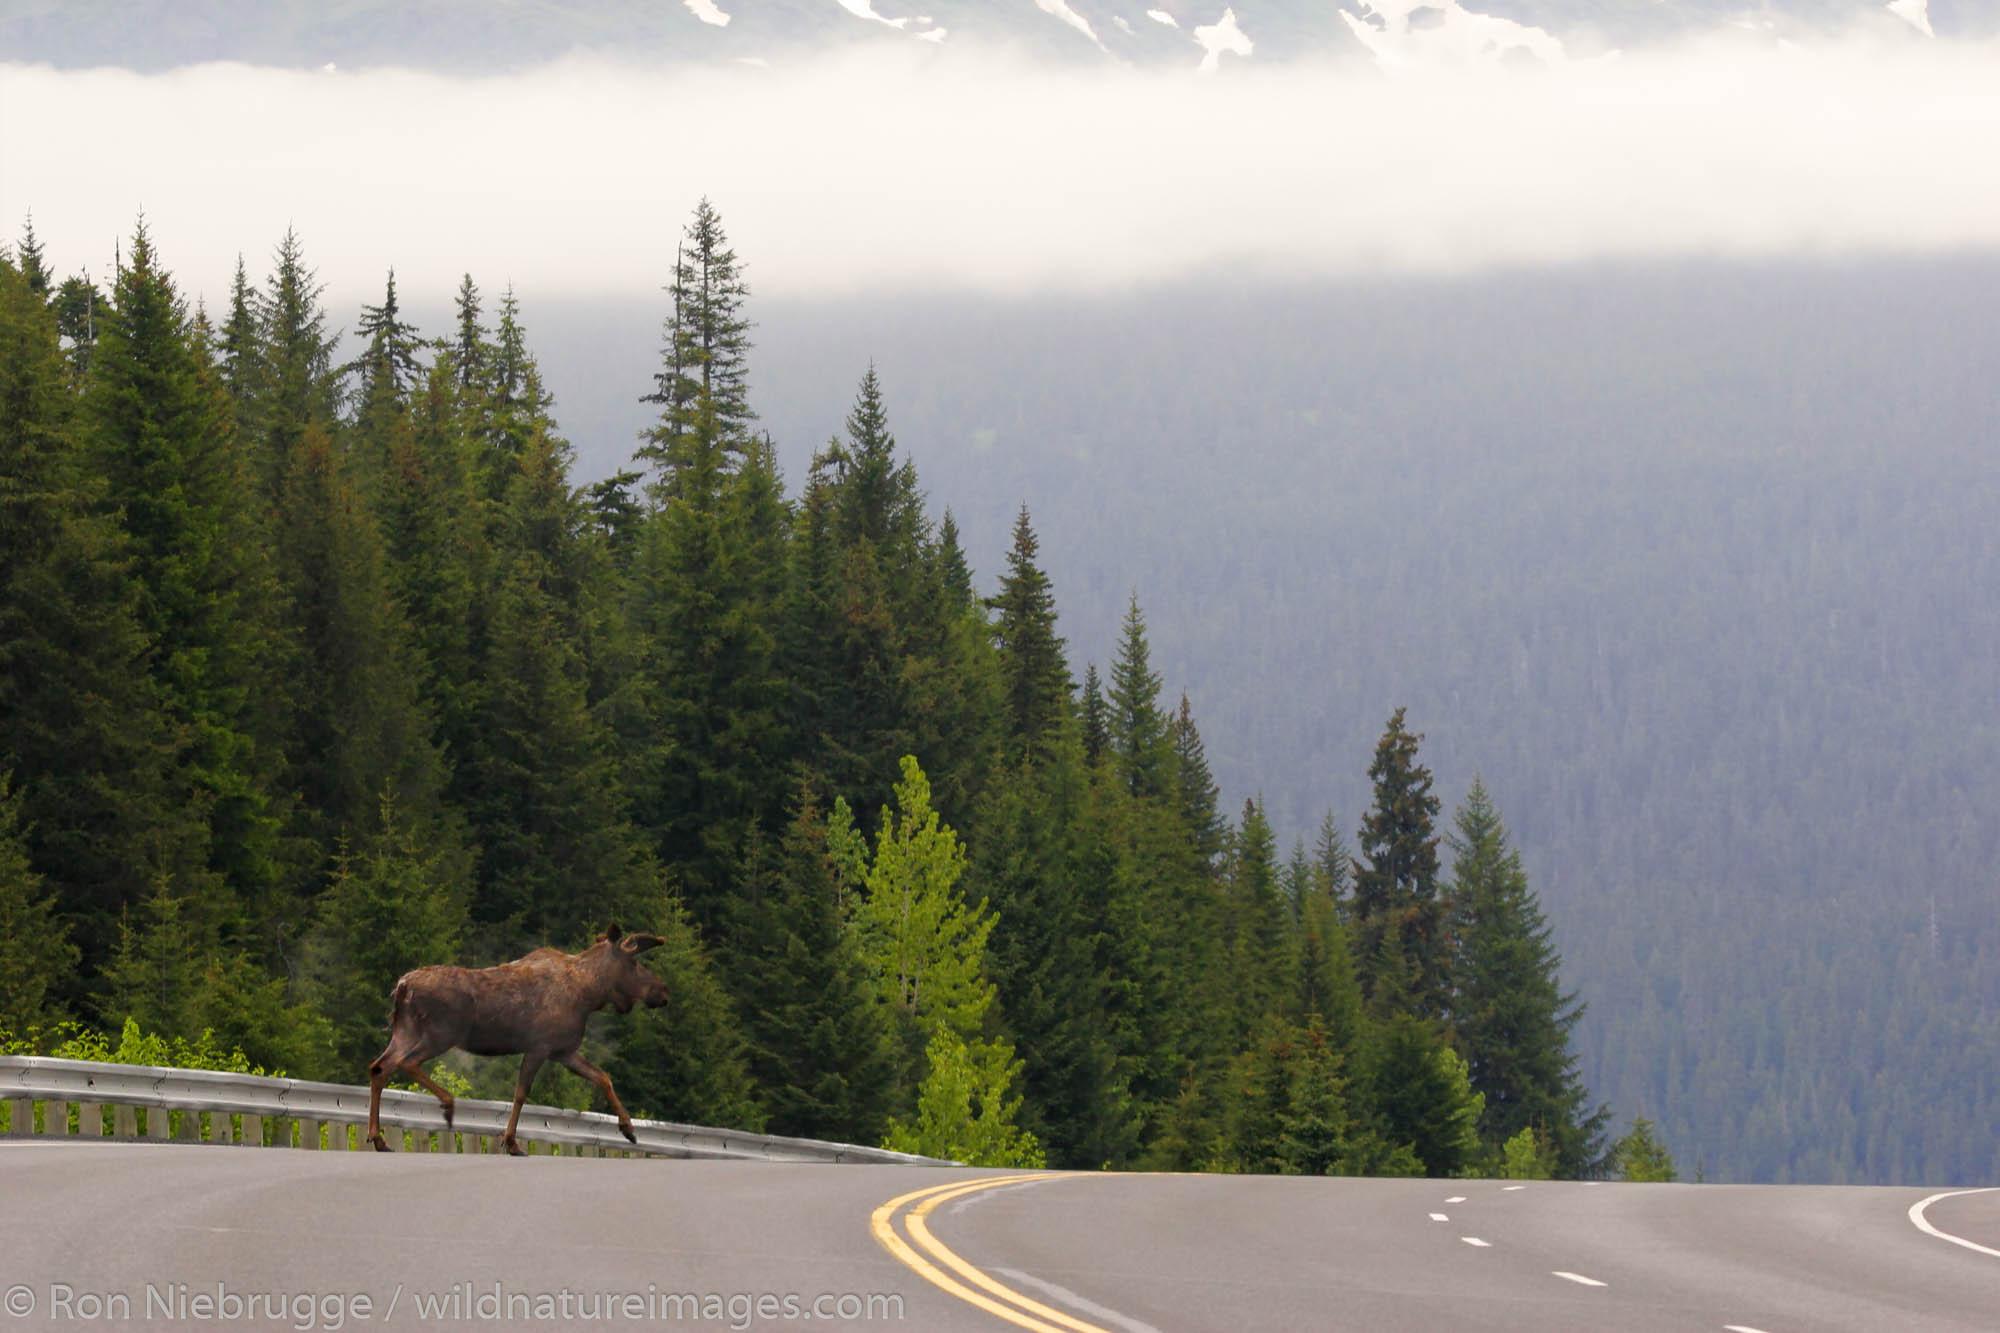 Moose crossing the Seward Highway, Kenai Peninsula, Chugach National Forest, Alaska.